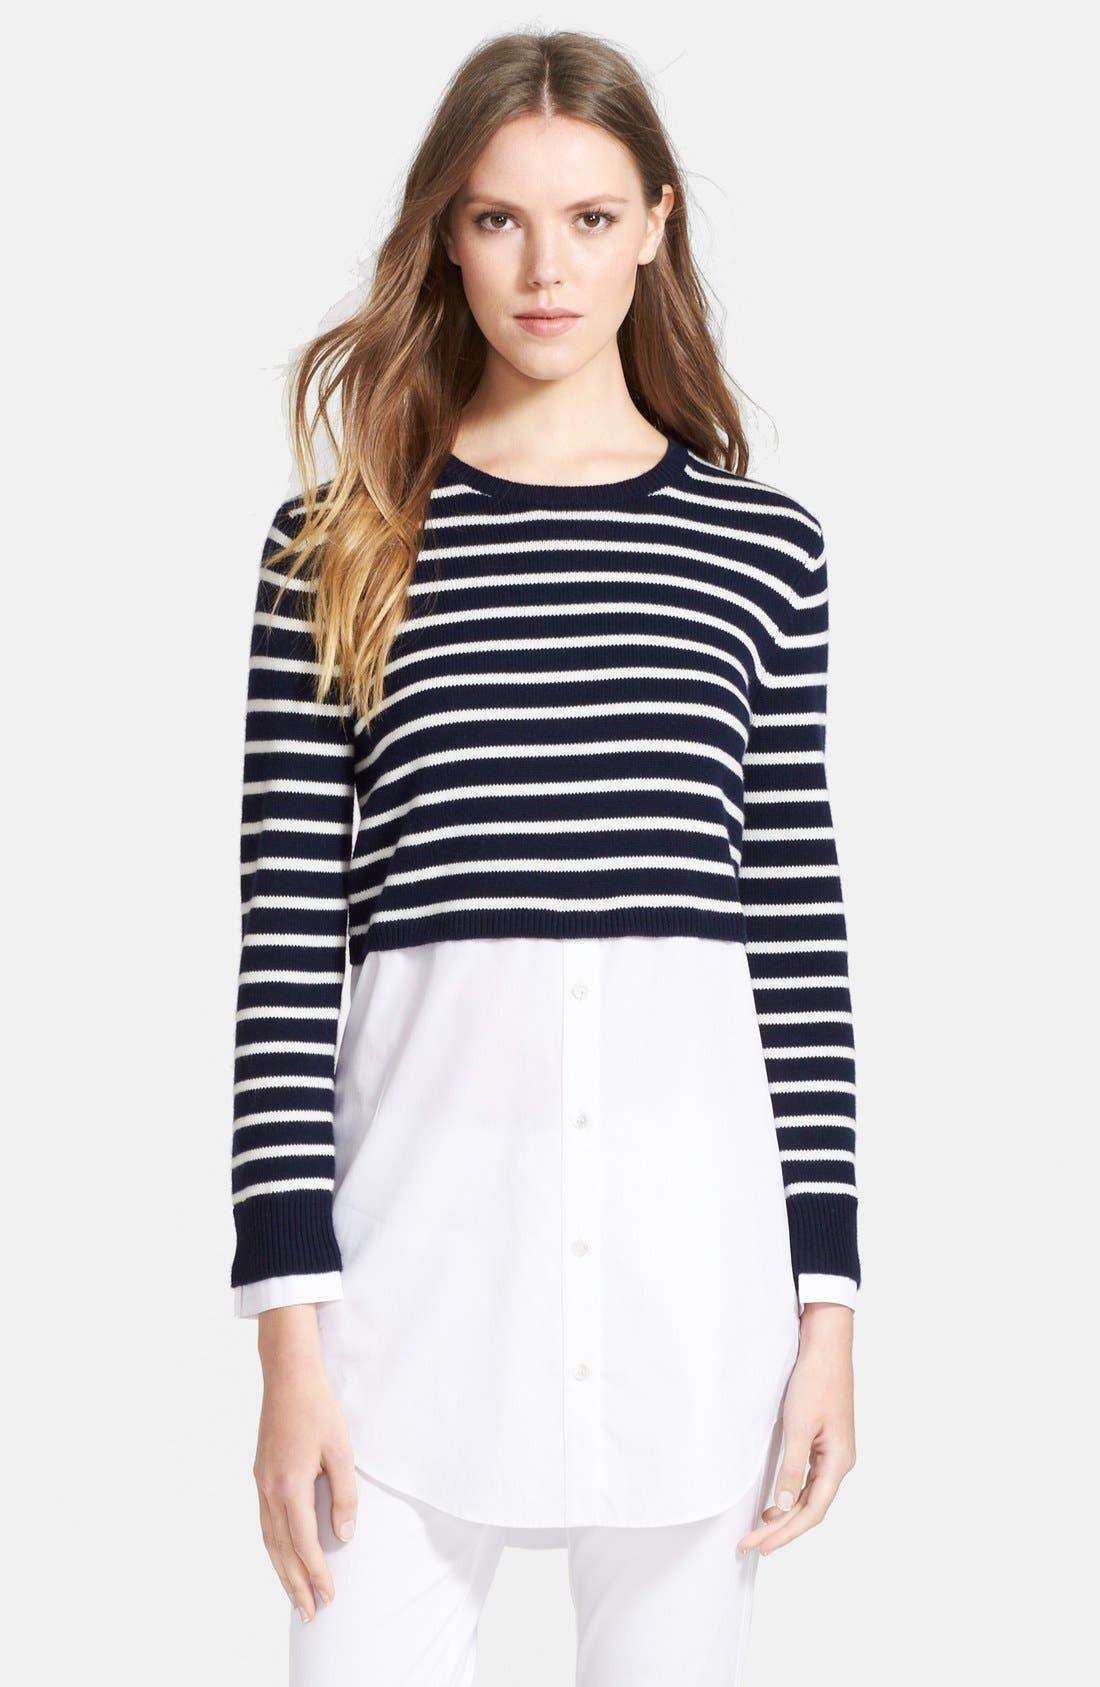 Alternate Image 1 Selected - Theory 'Rymalia' Stripe Crop Cotton & Cashmere Sweater with Poplin Underlay